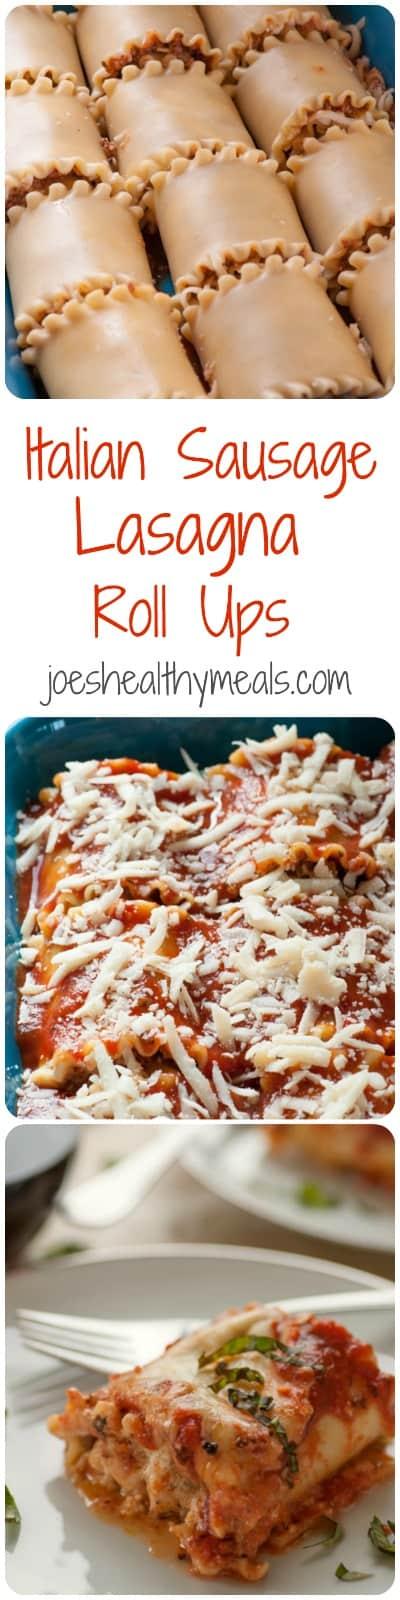 Italian sausage lasagna roll ups Pinterest collage.